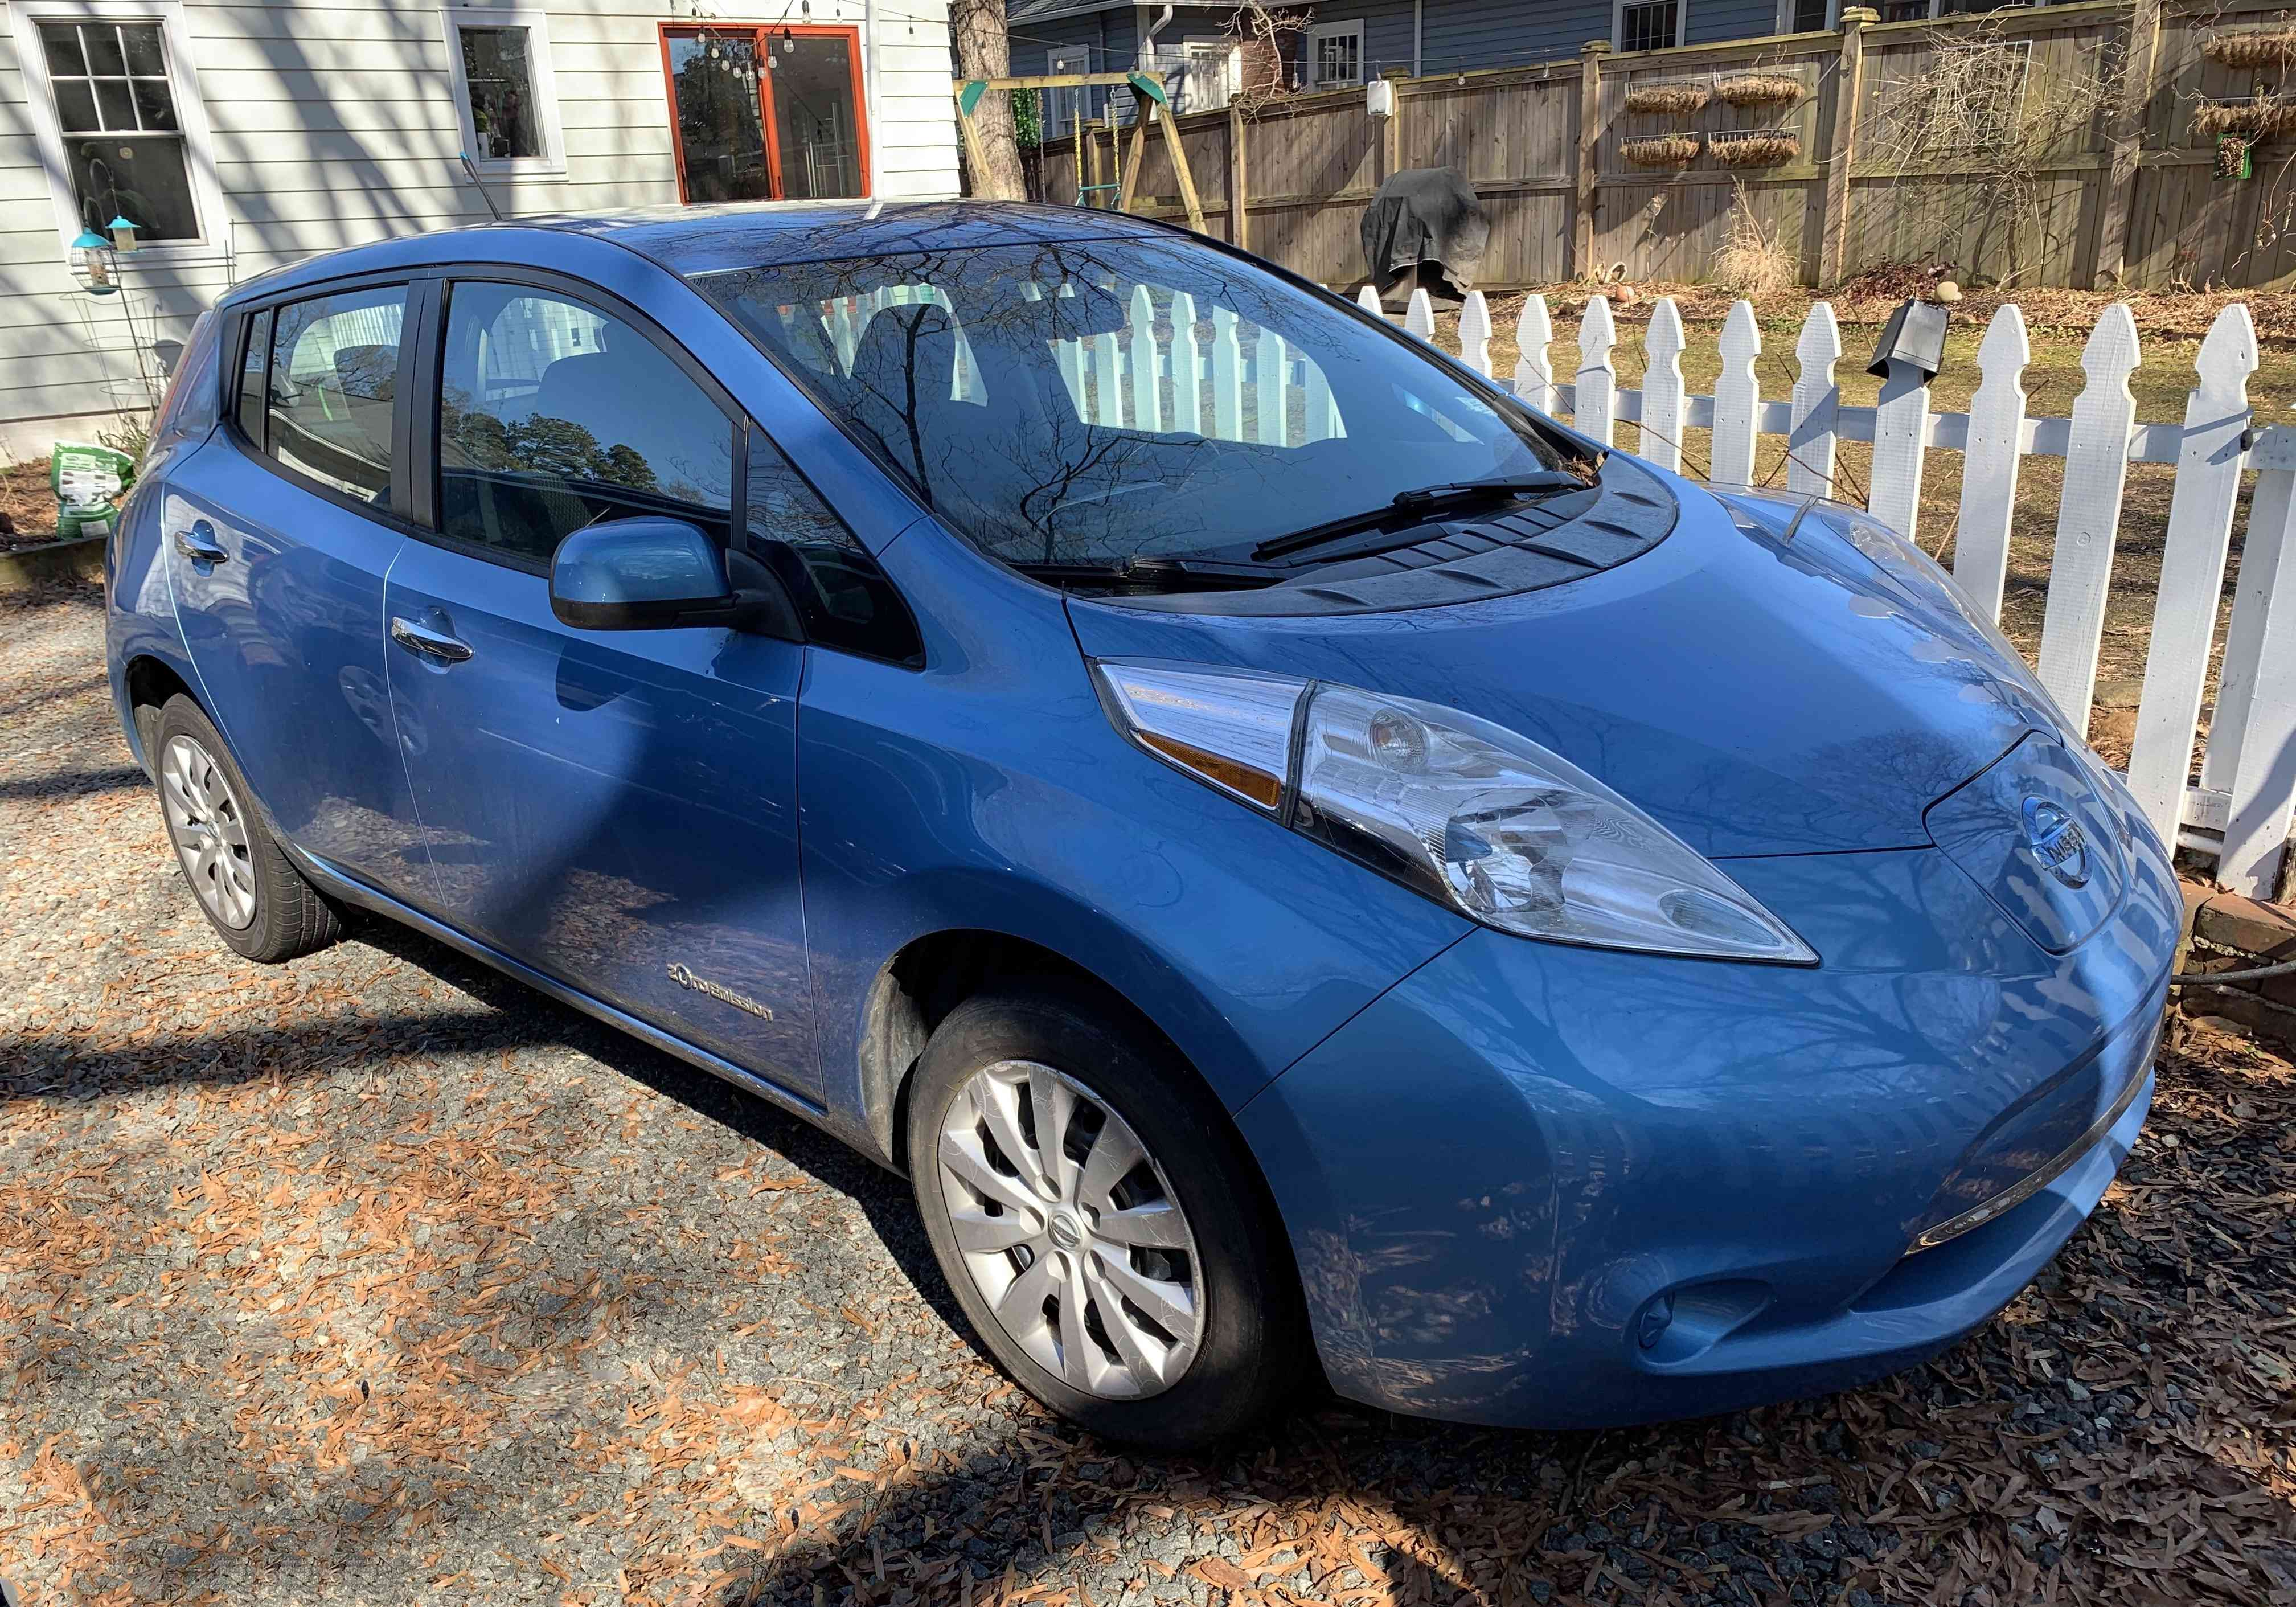 Blue Nissan Leaf in the driveway